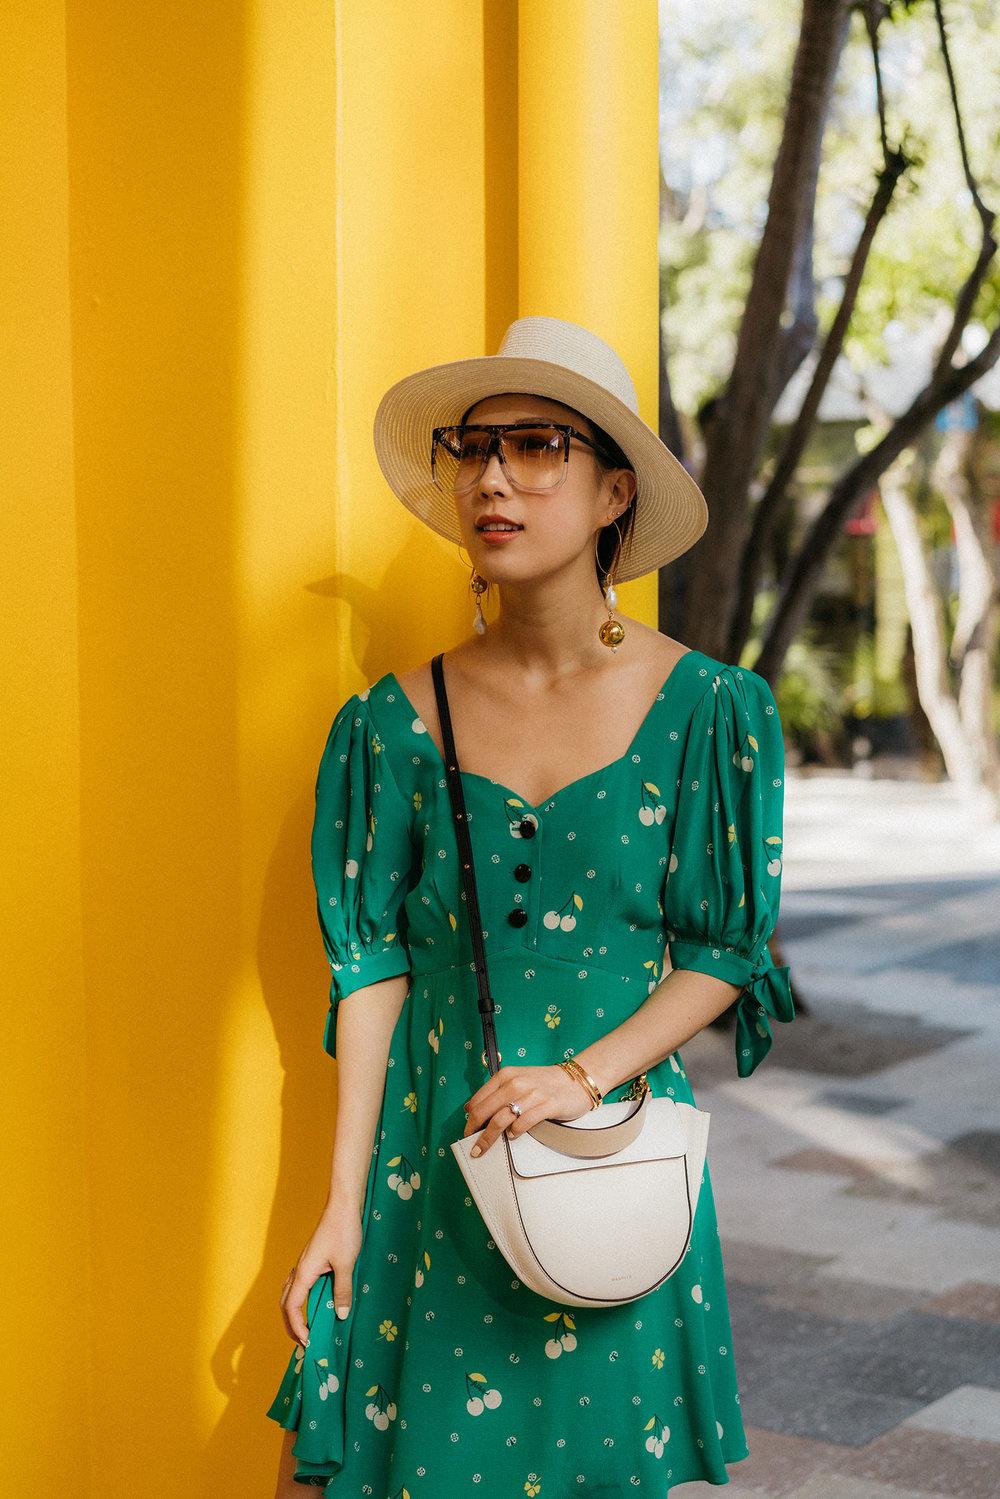 Sretsis Dress ,  Loewe Sunglasses ,  Mounser Earrings , Maison Michel Hat,  Wandler Bag